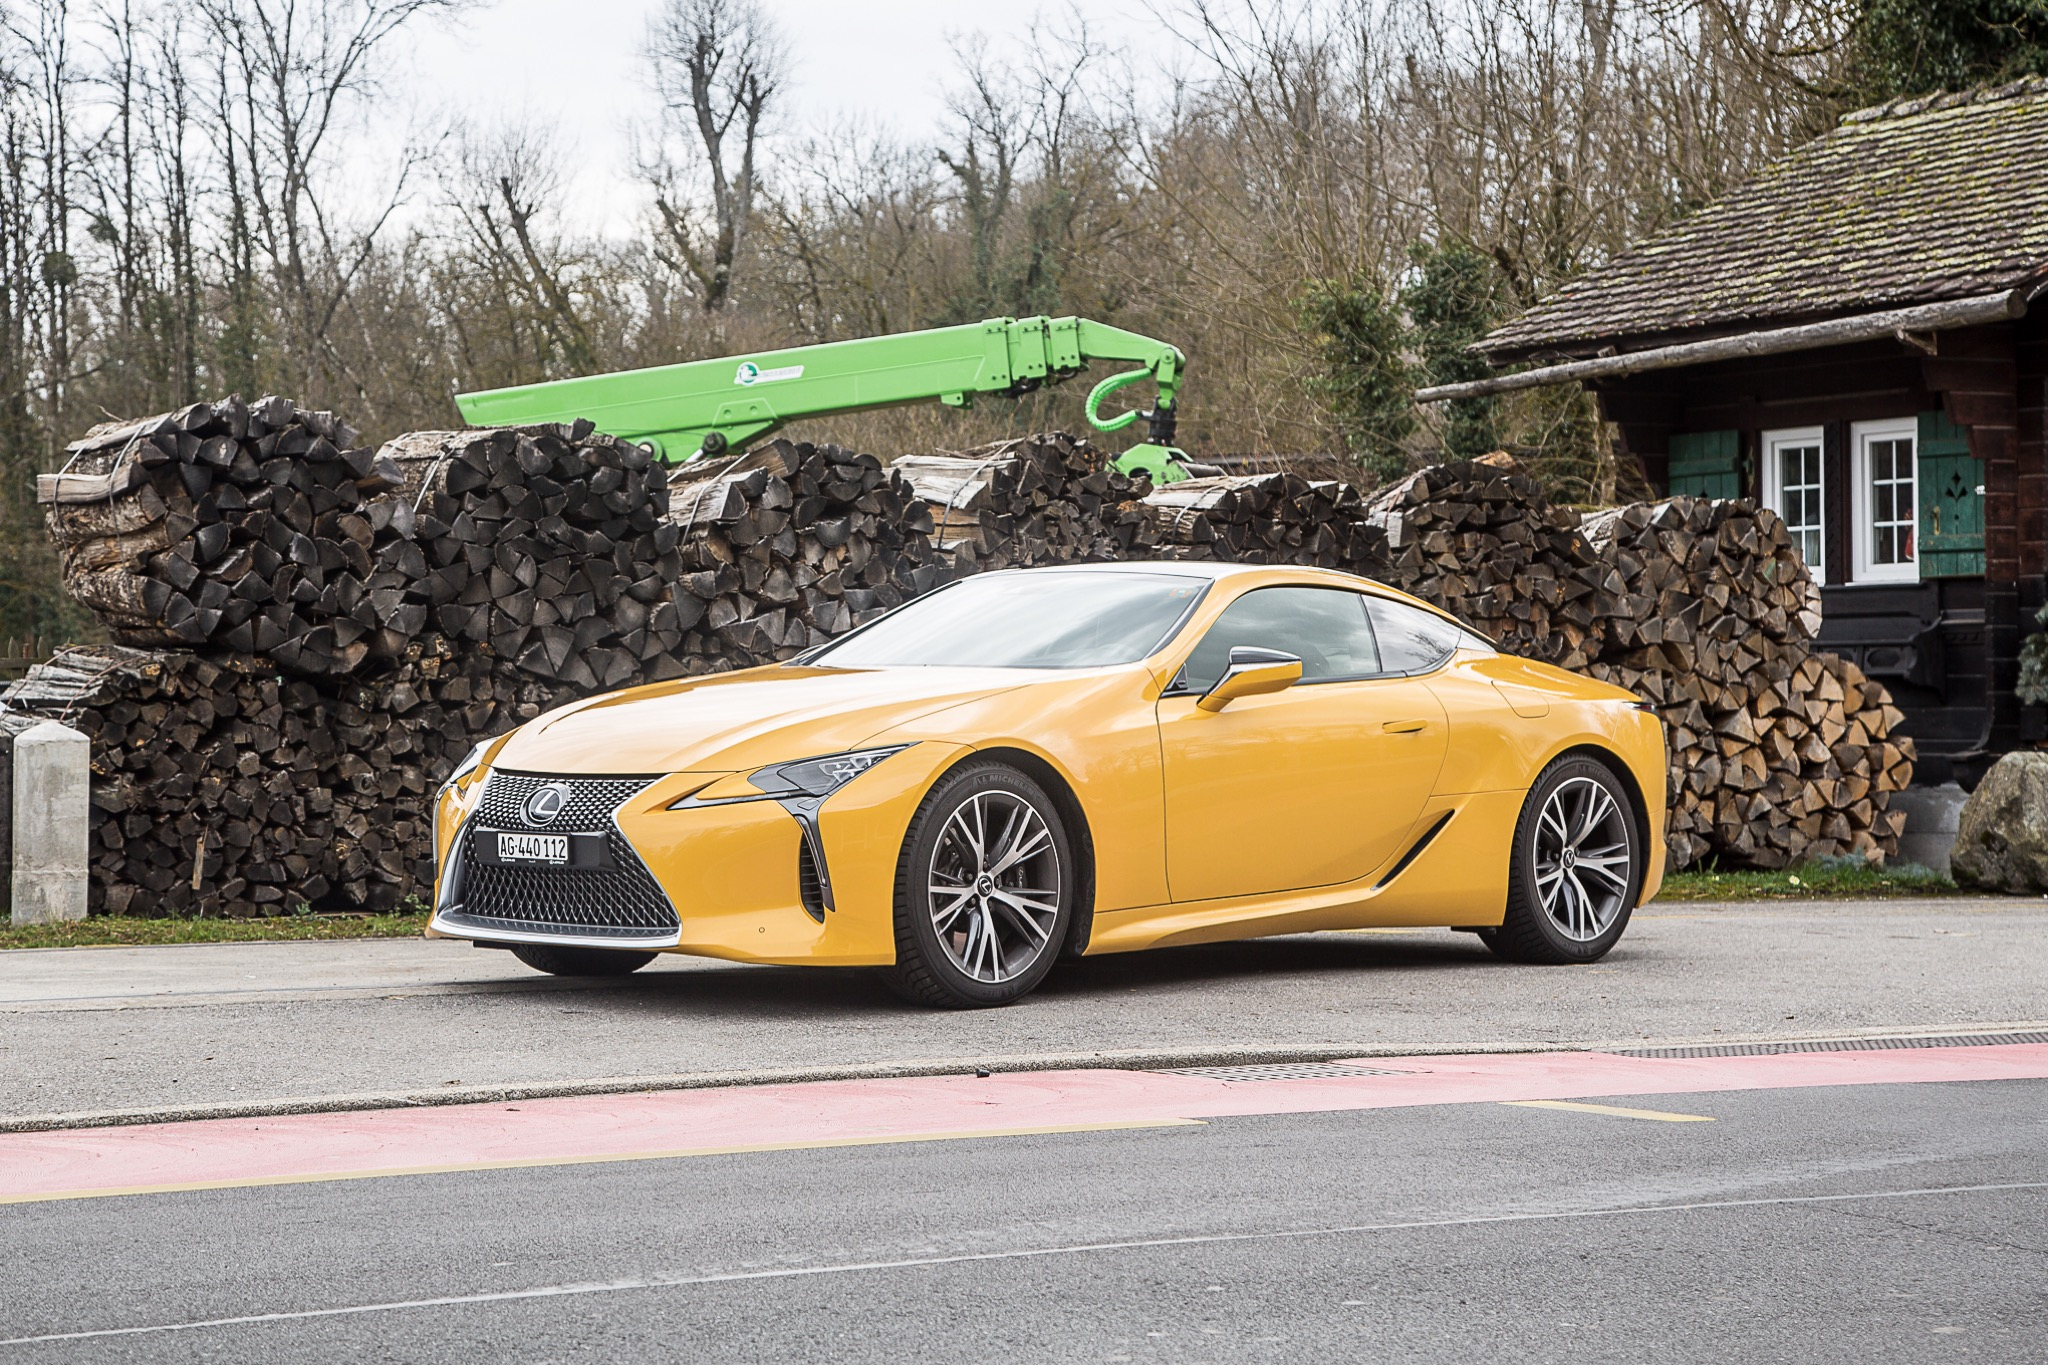 Essai Lexus Lc 500 Le Grand Plaisir Coupable Wheels And You Com